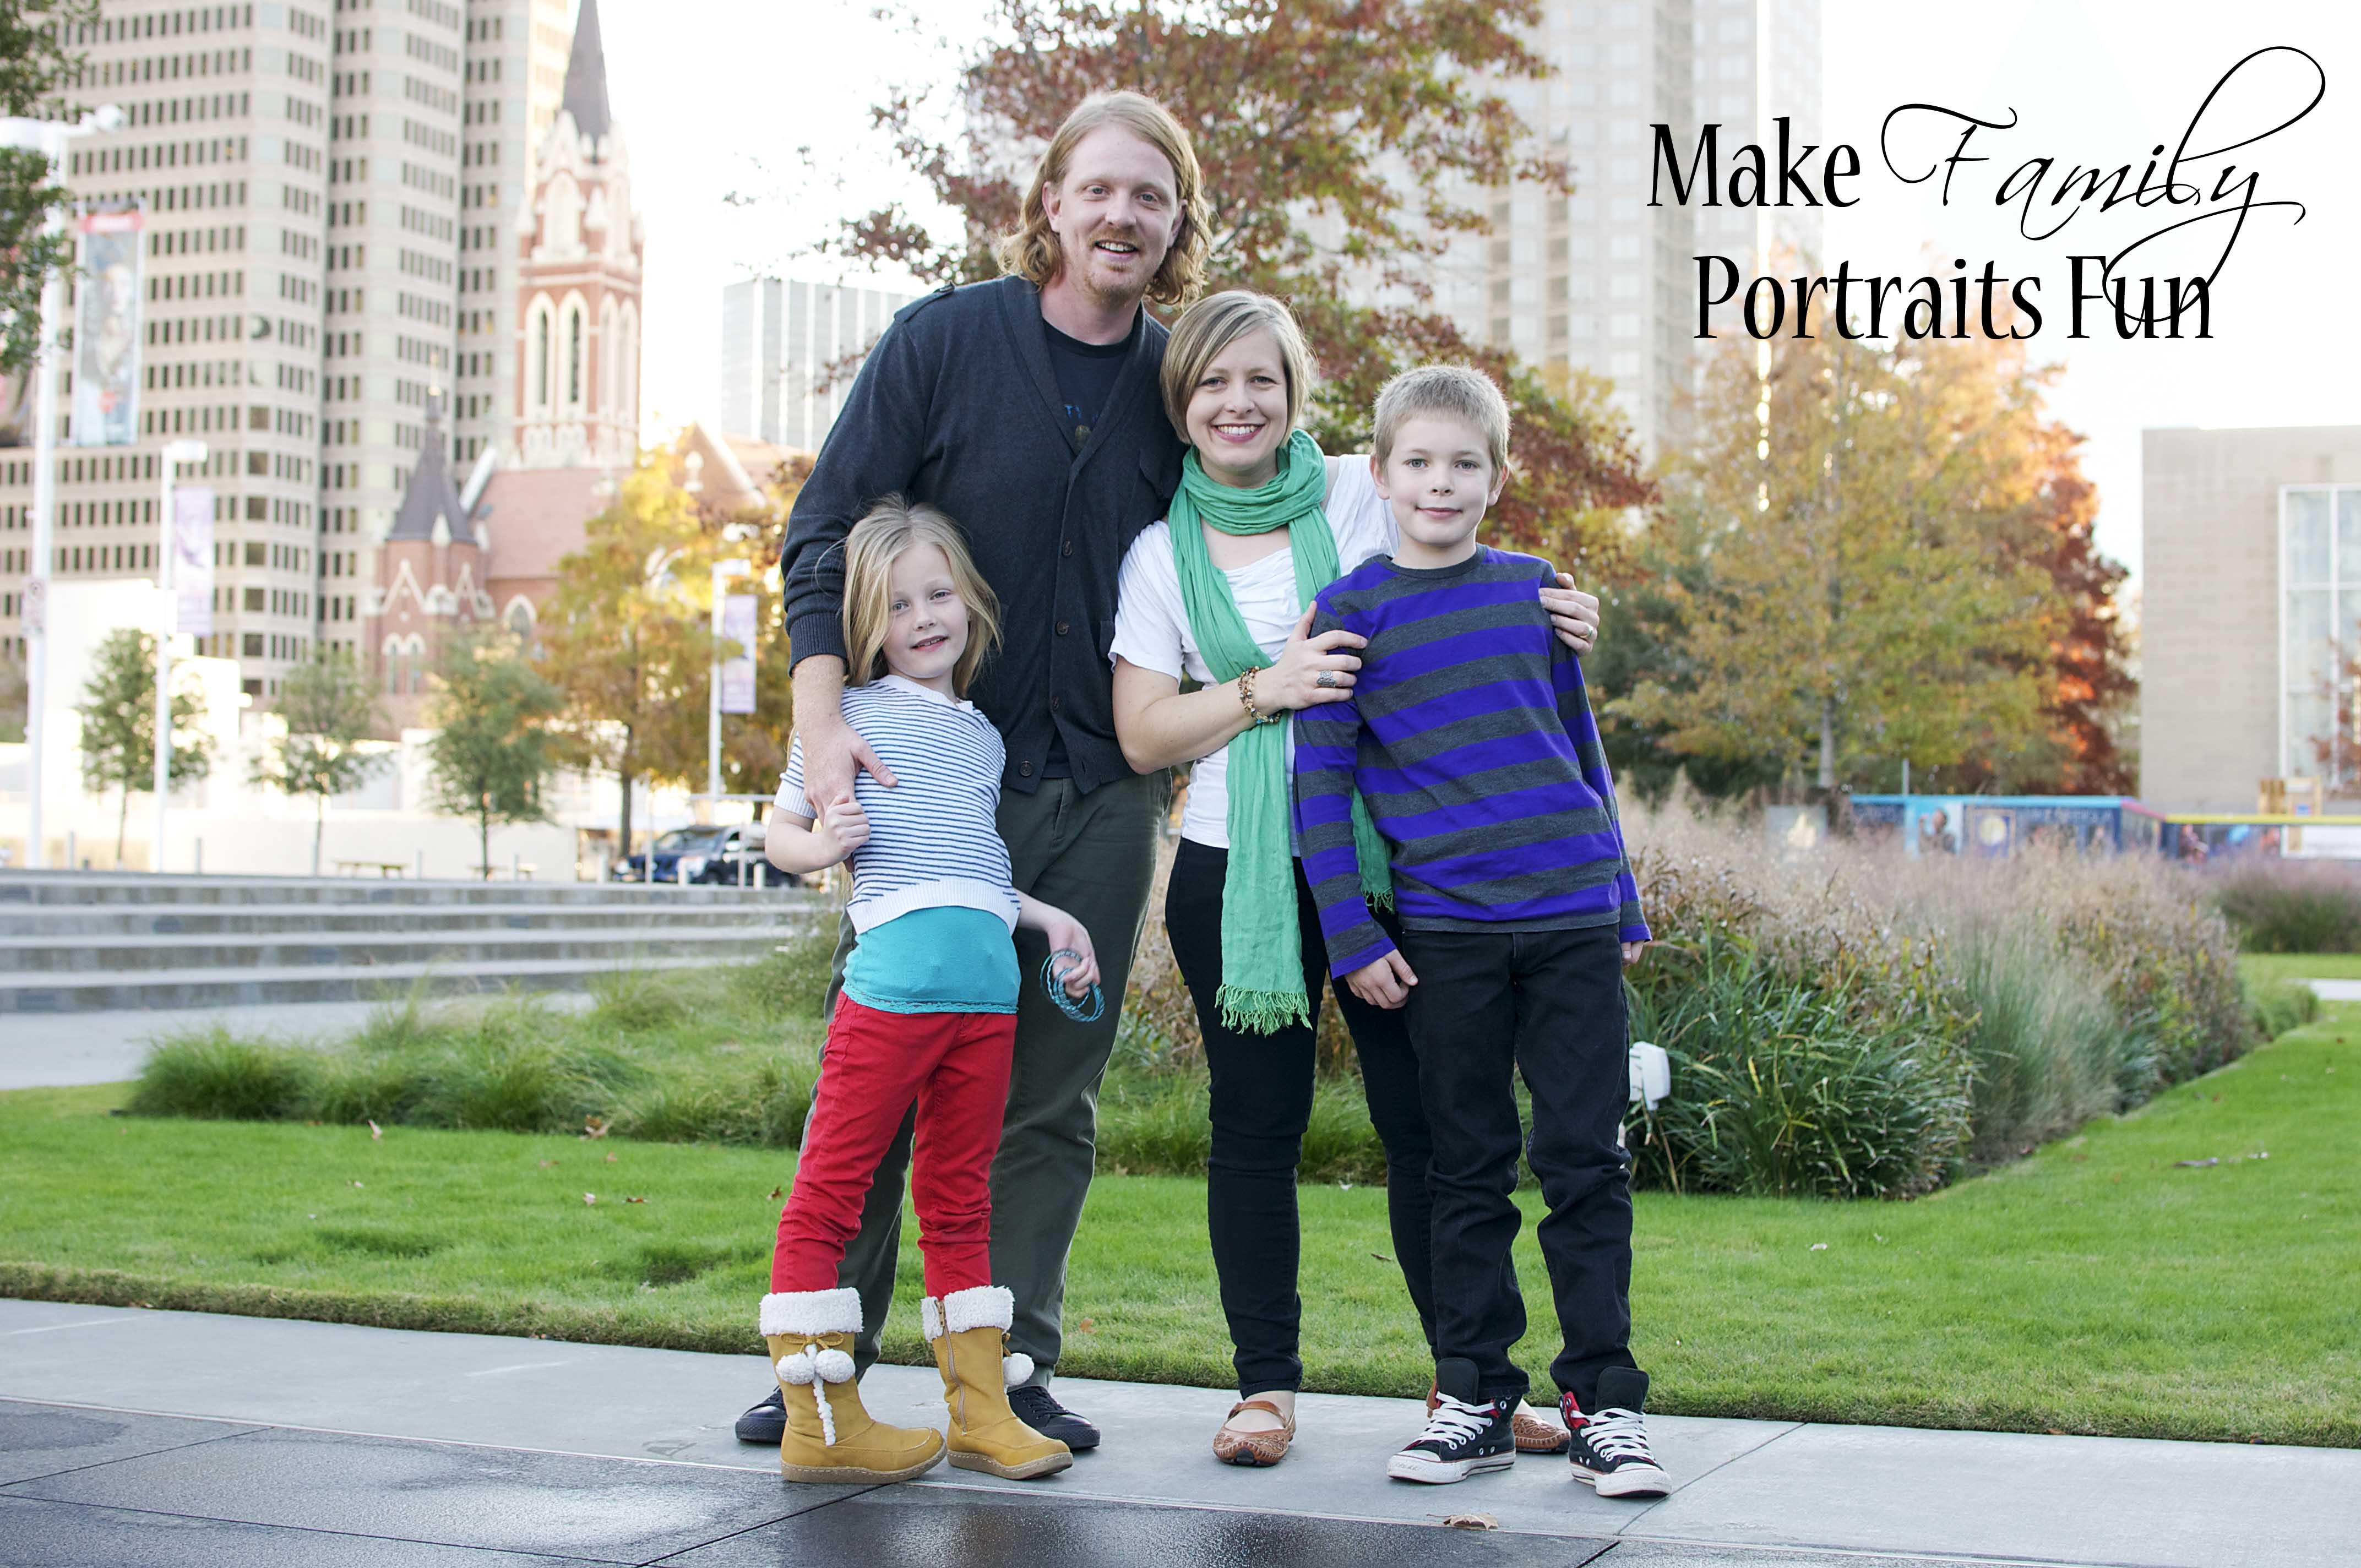 Make Family Portraits Fun